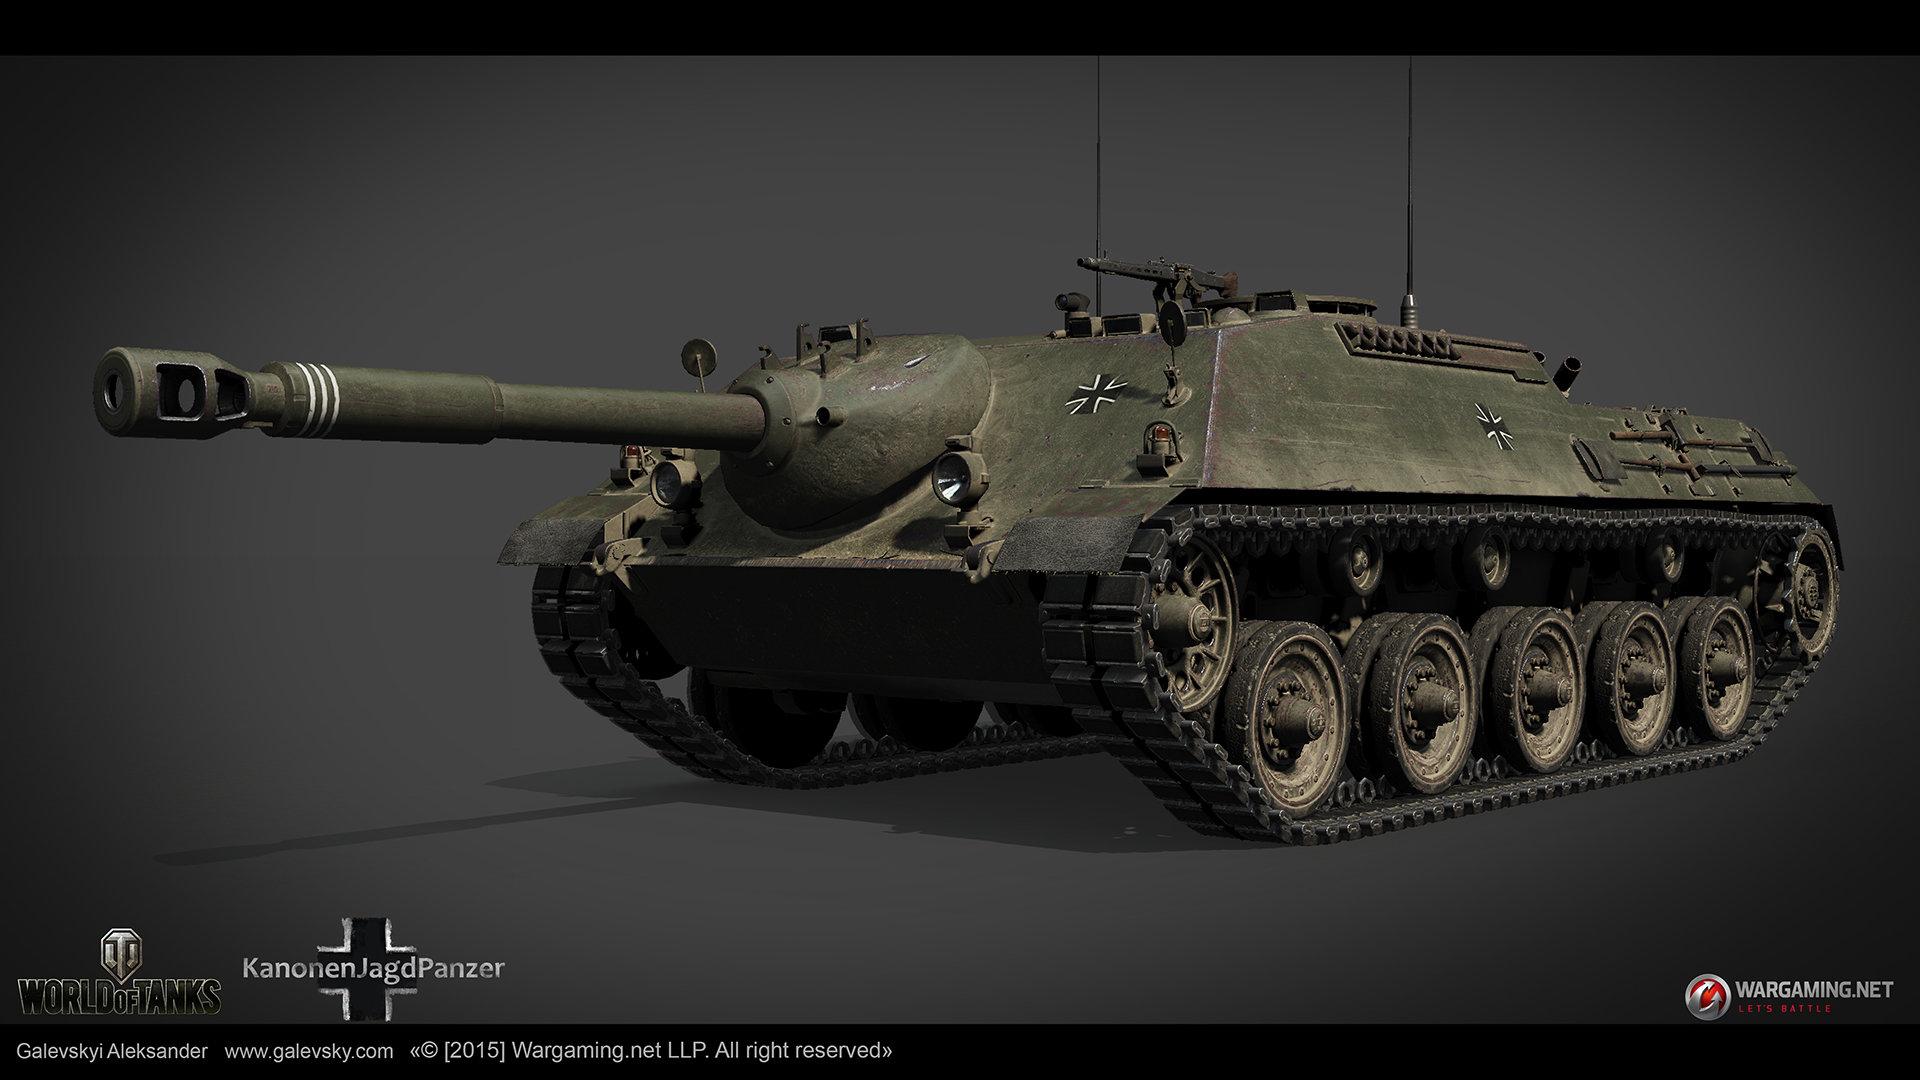 Aleksander galevskyi kanonenjagdpanzer fin small 09